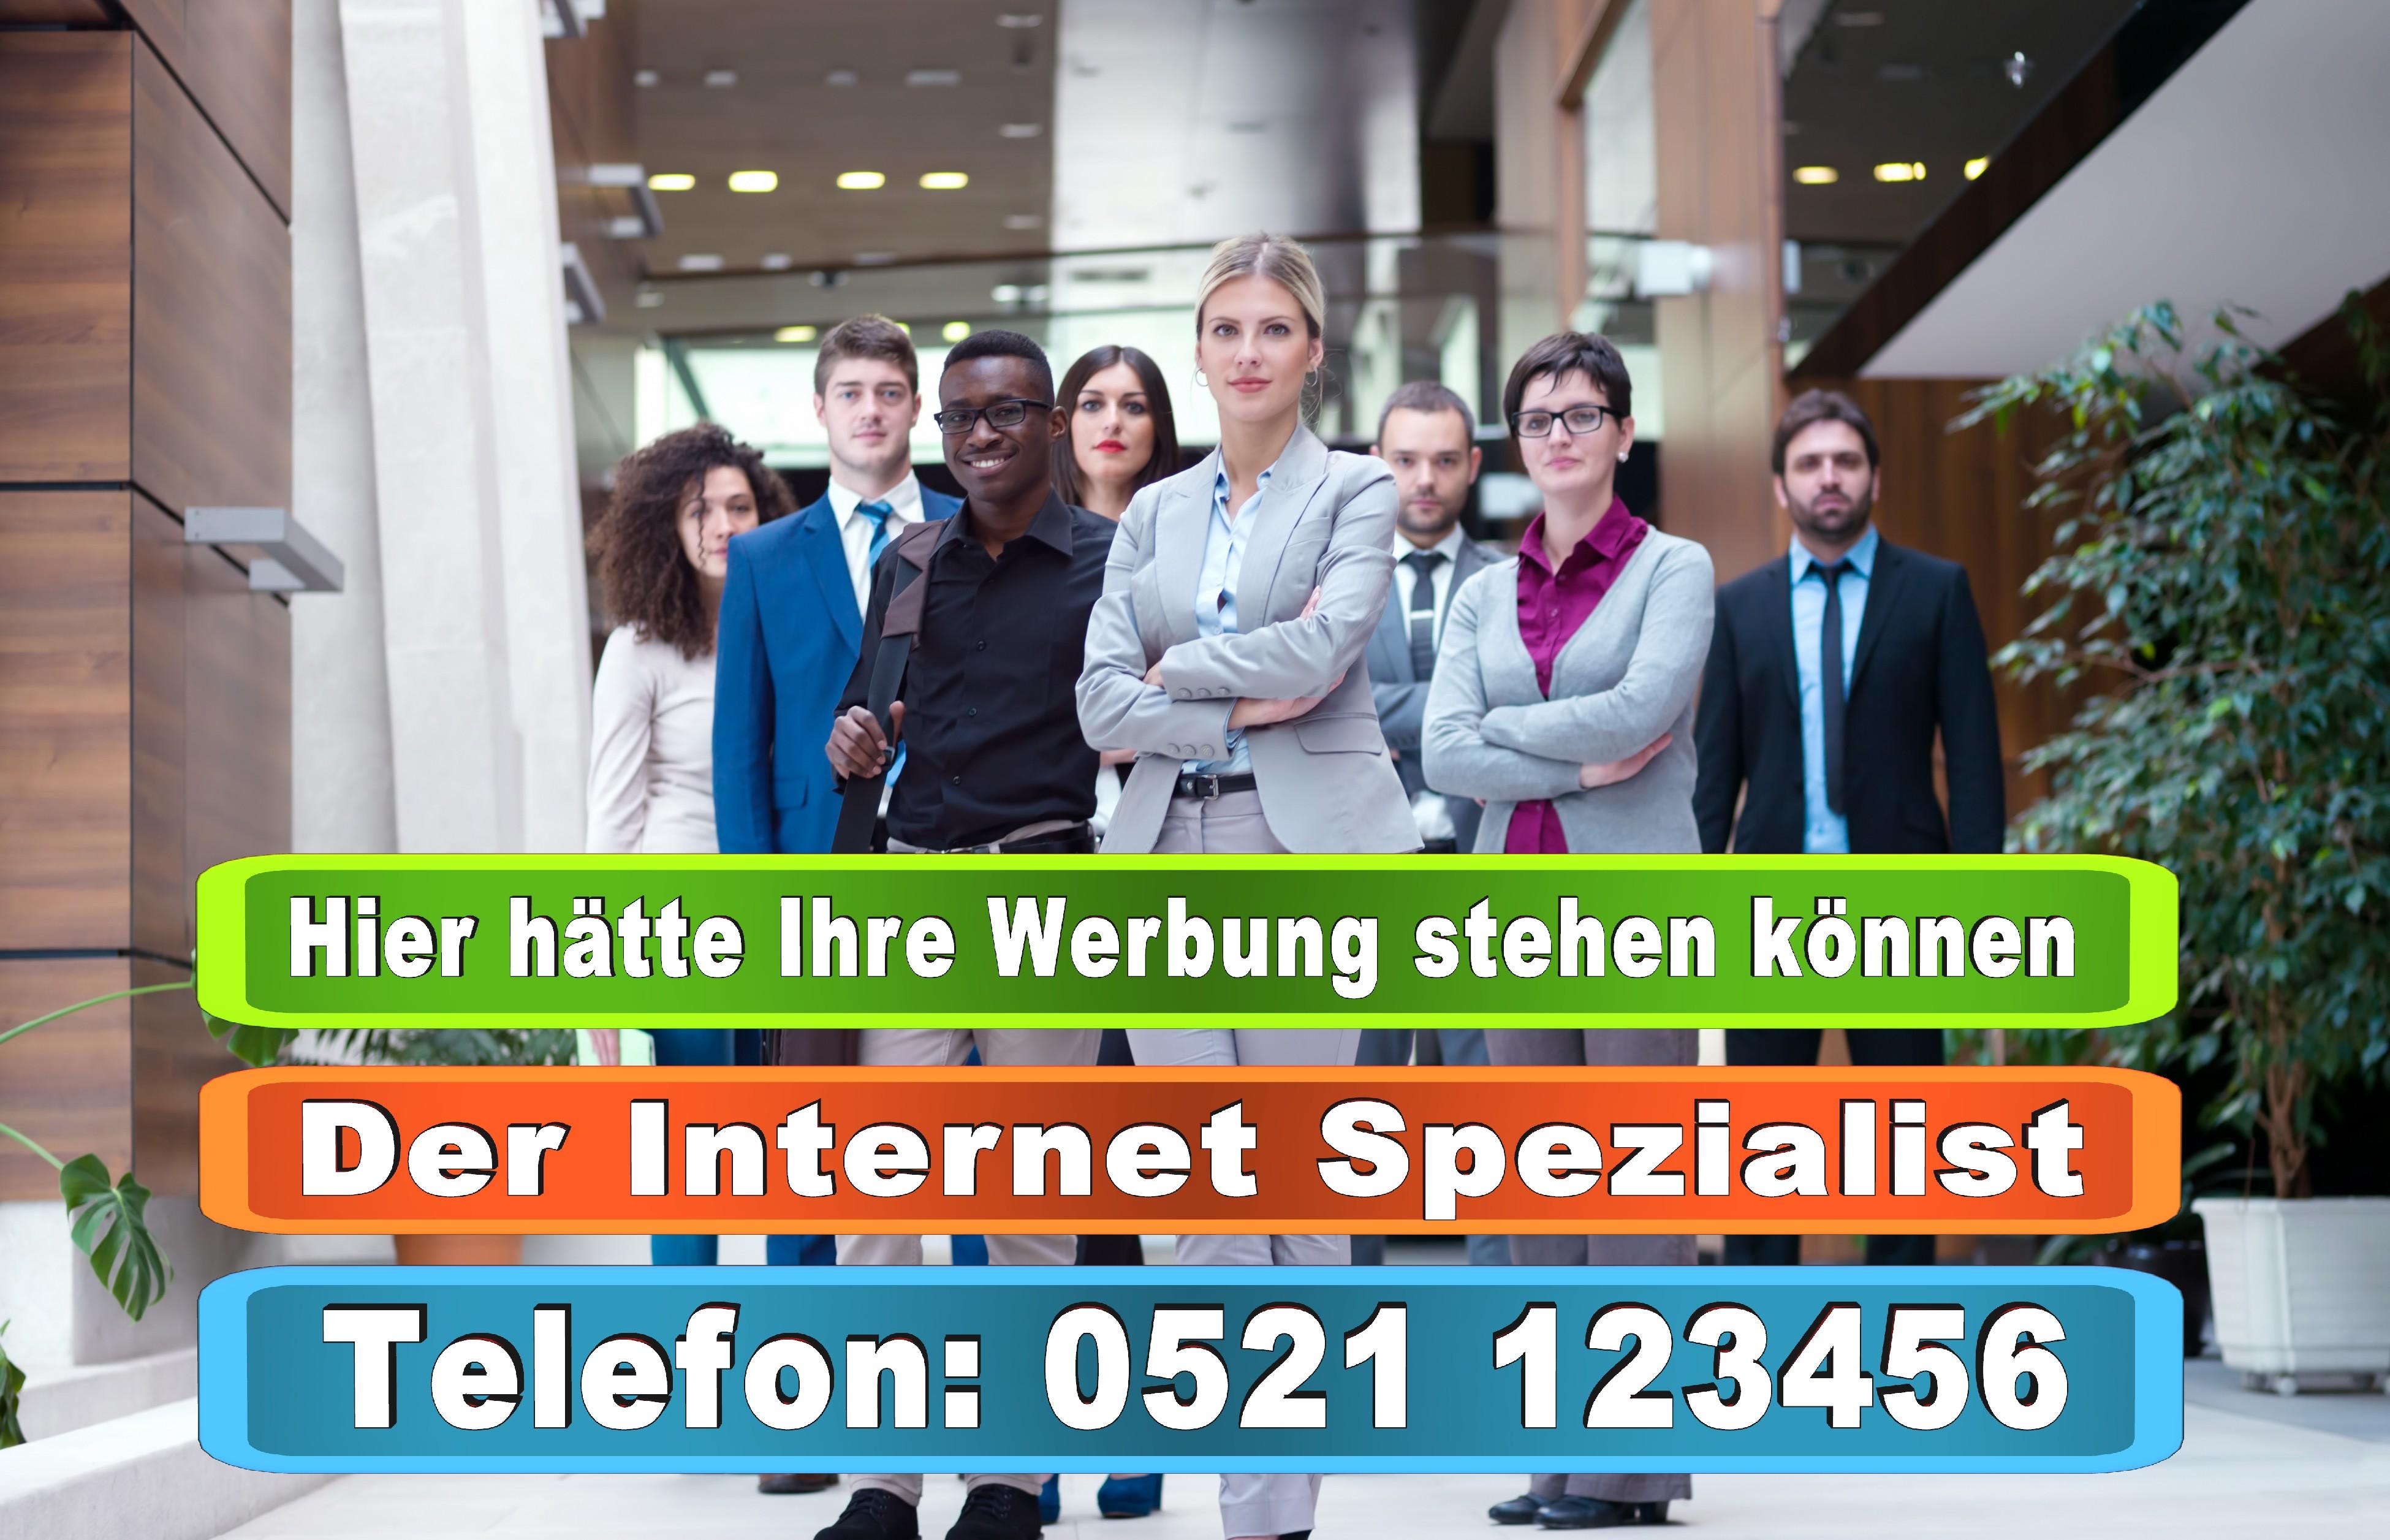 Rechtsanwaltskanzlei Bielefeld NRW OWL Rechtsanwalt Kanzlei Büro Steuerberater Bielefeld Architekt Bielefeld (19)